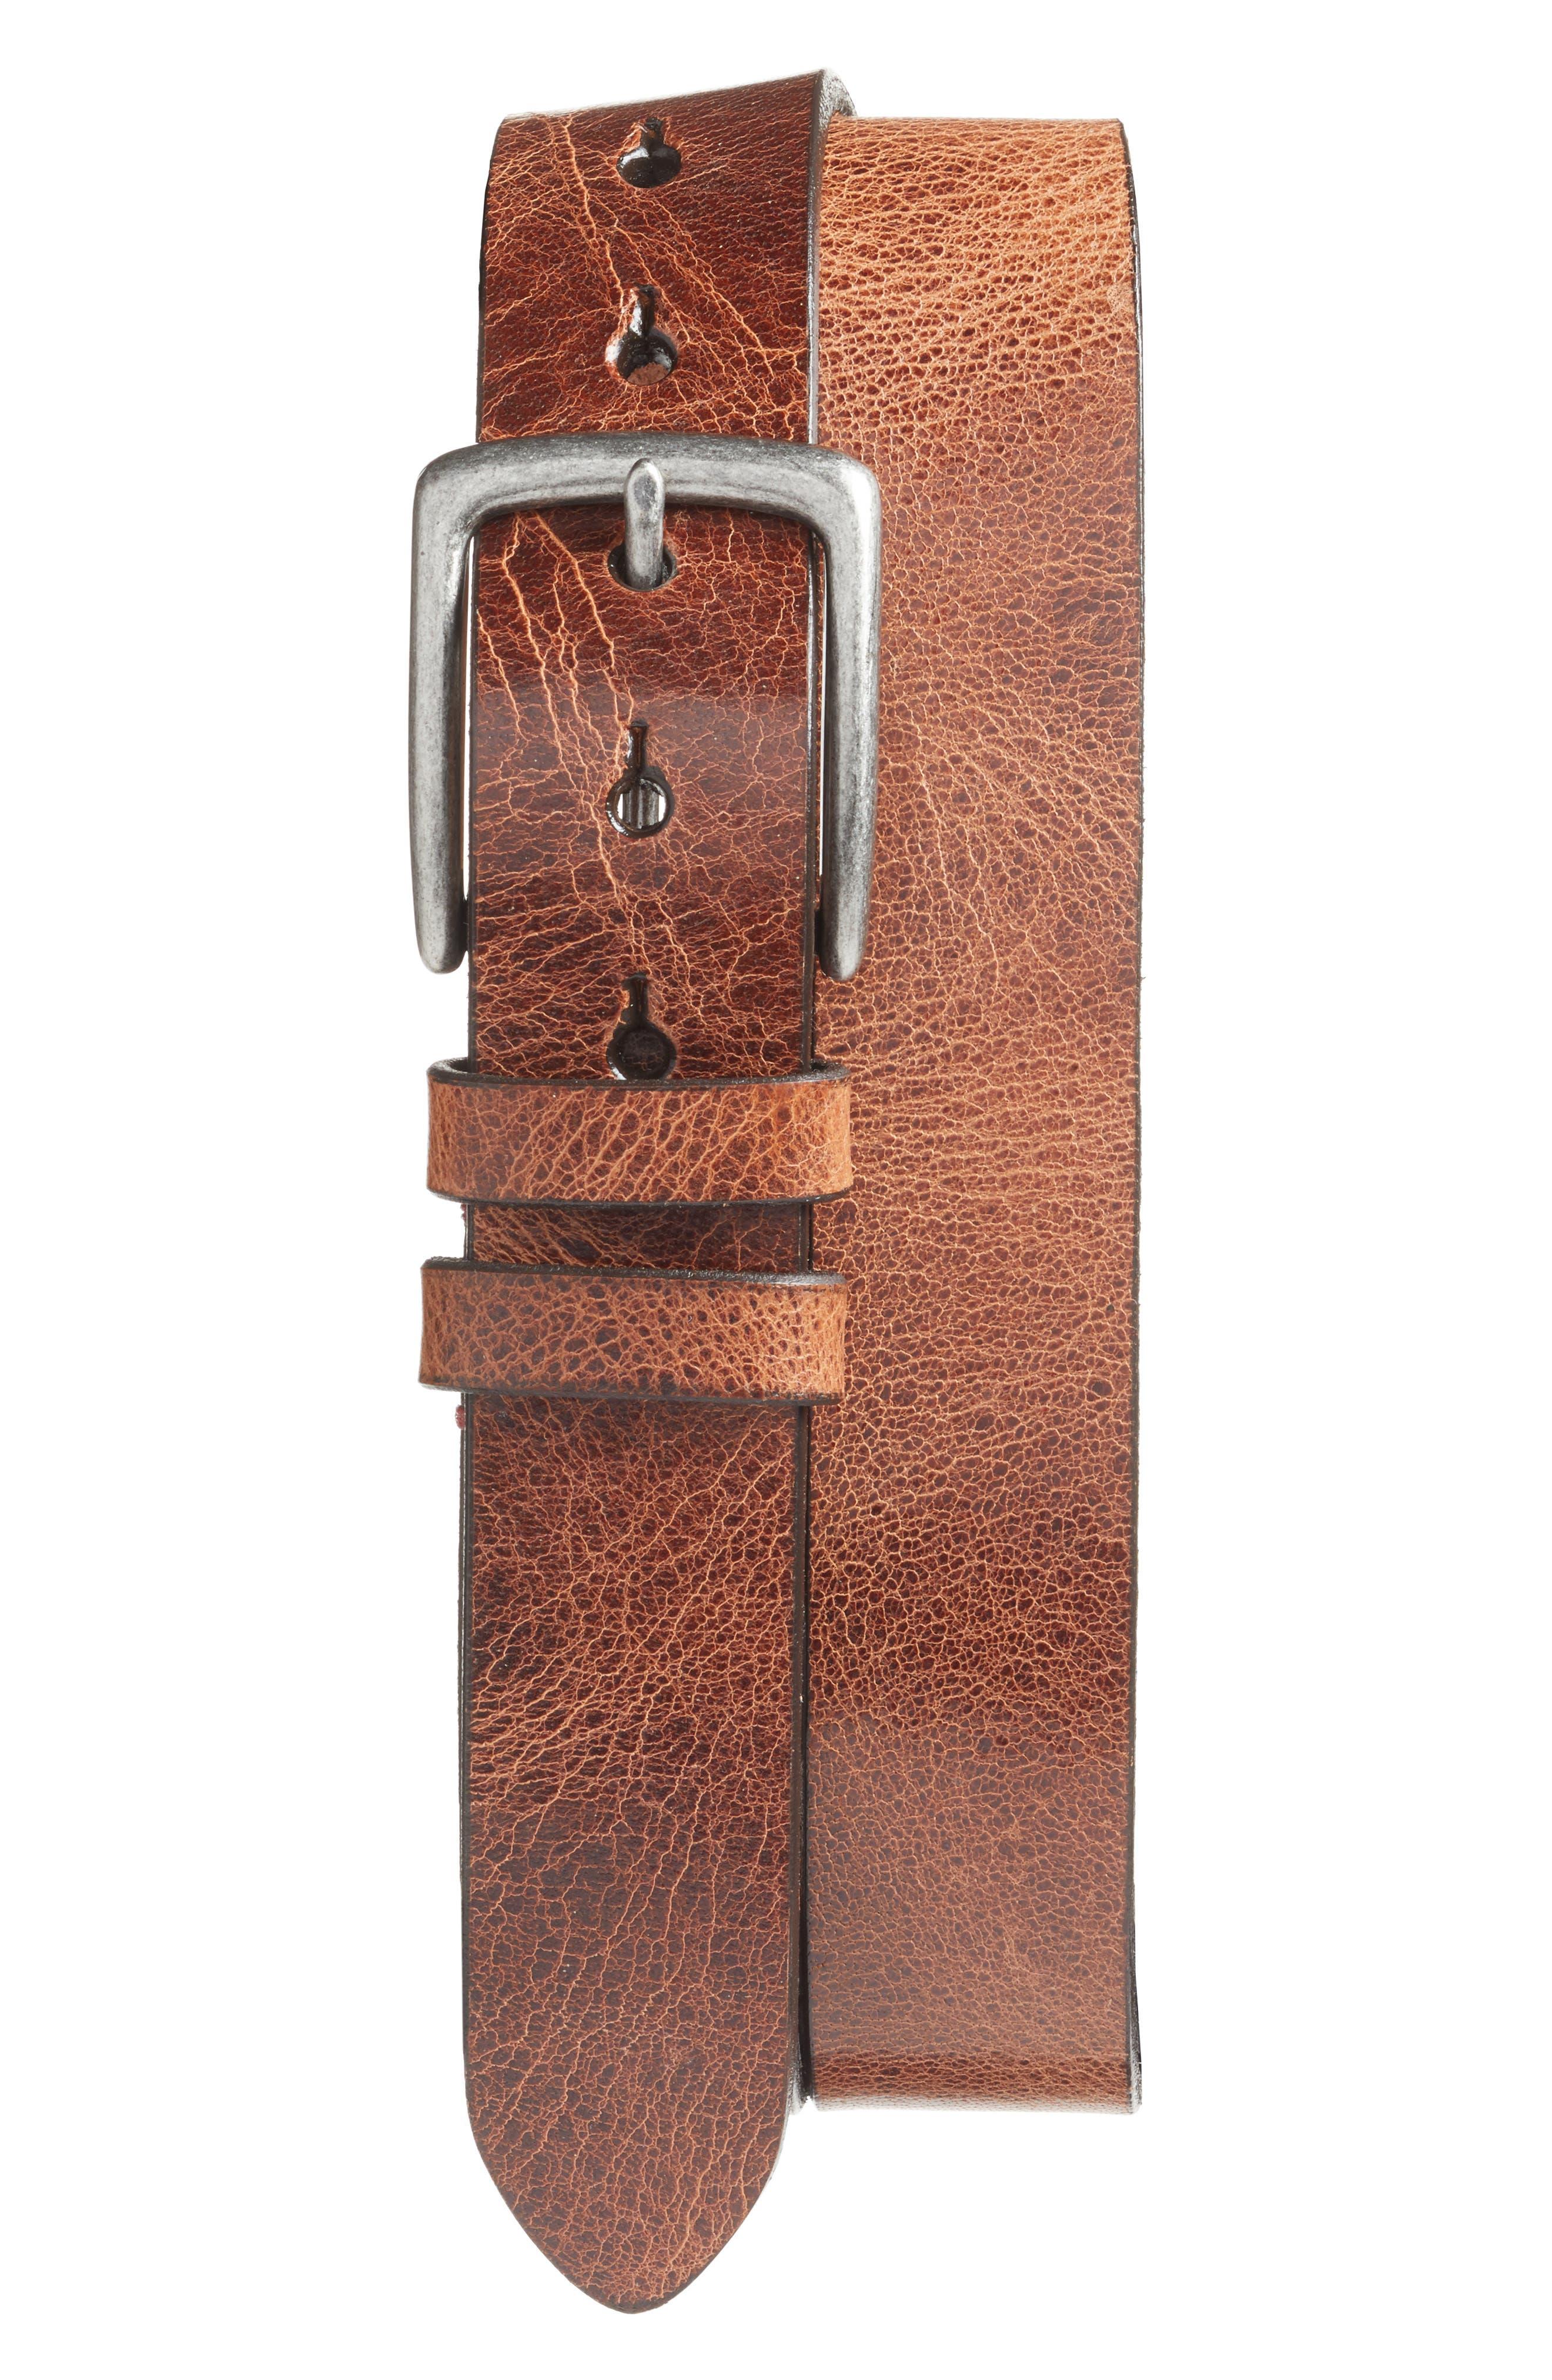 Main Image - Torino Belts Leather Belt